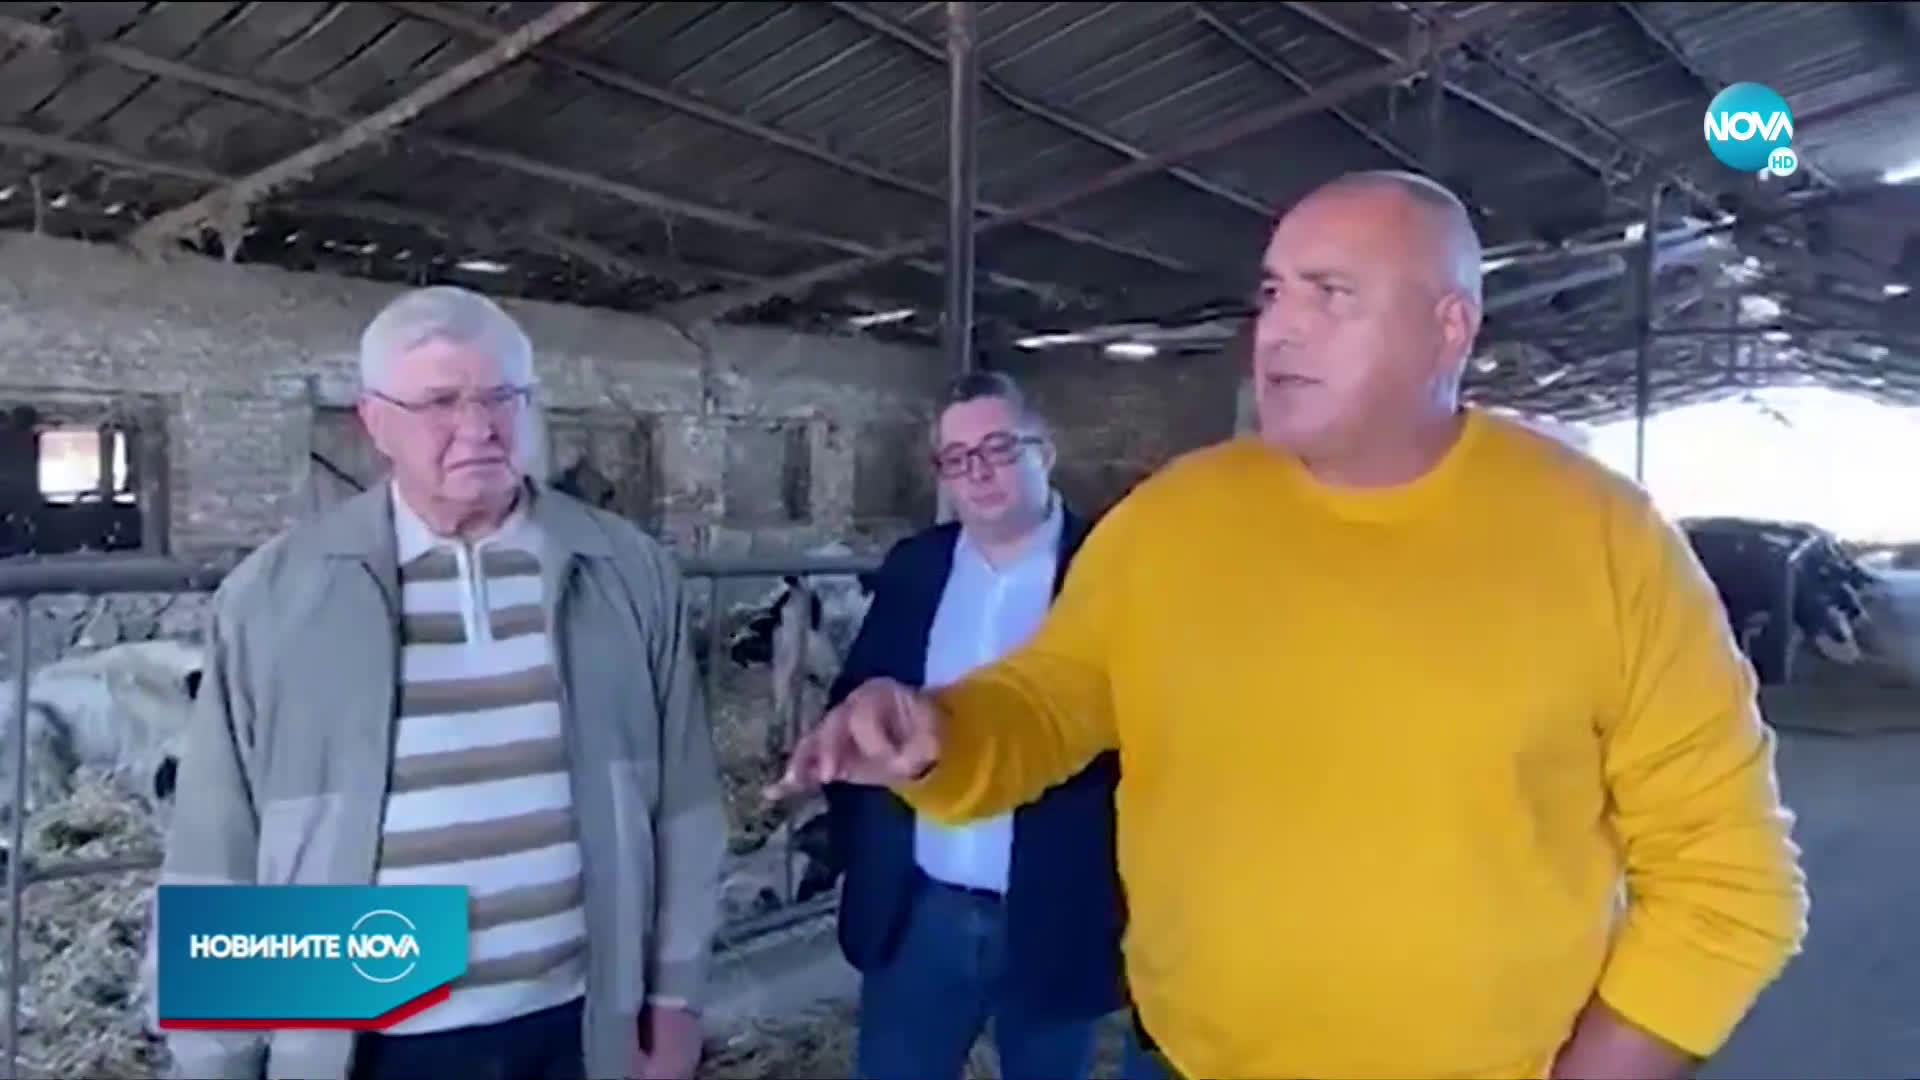 Борисов: 30 000 фермери са получили пари заради COVID-19